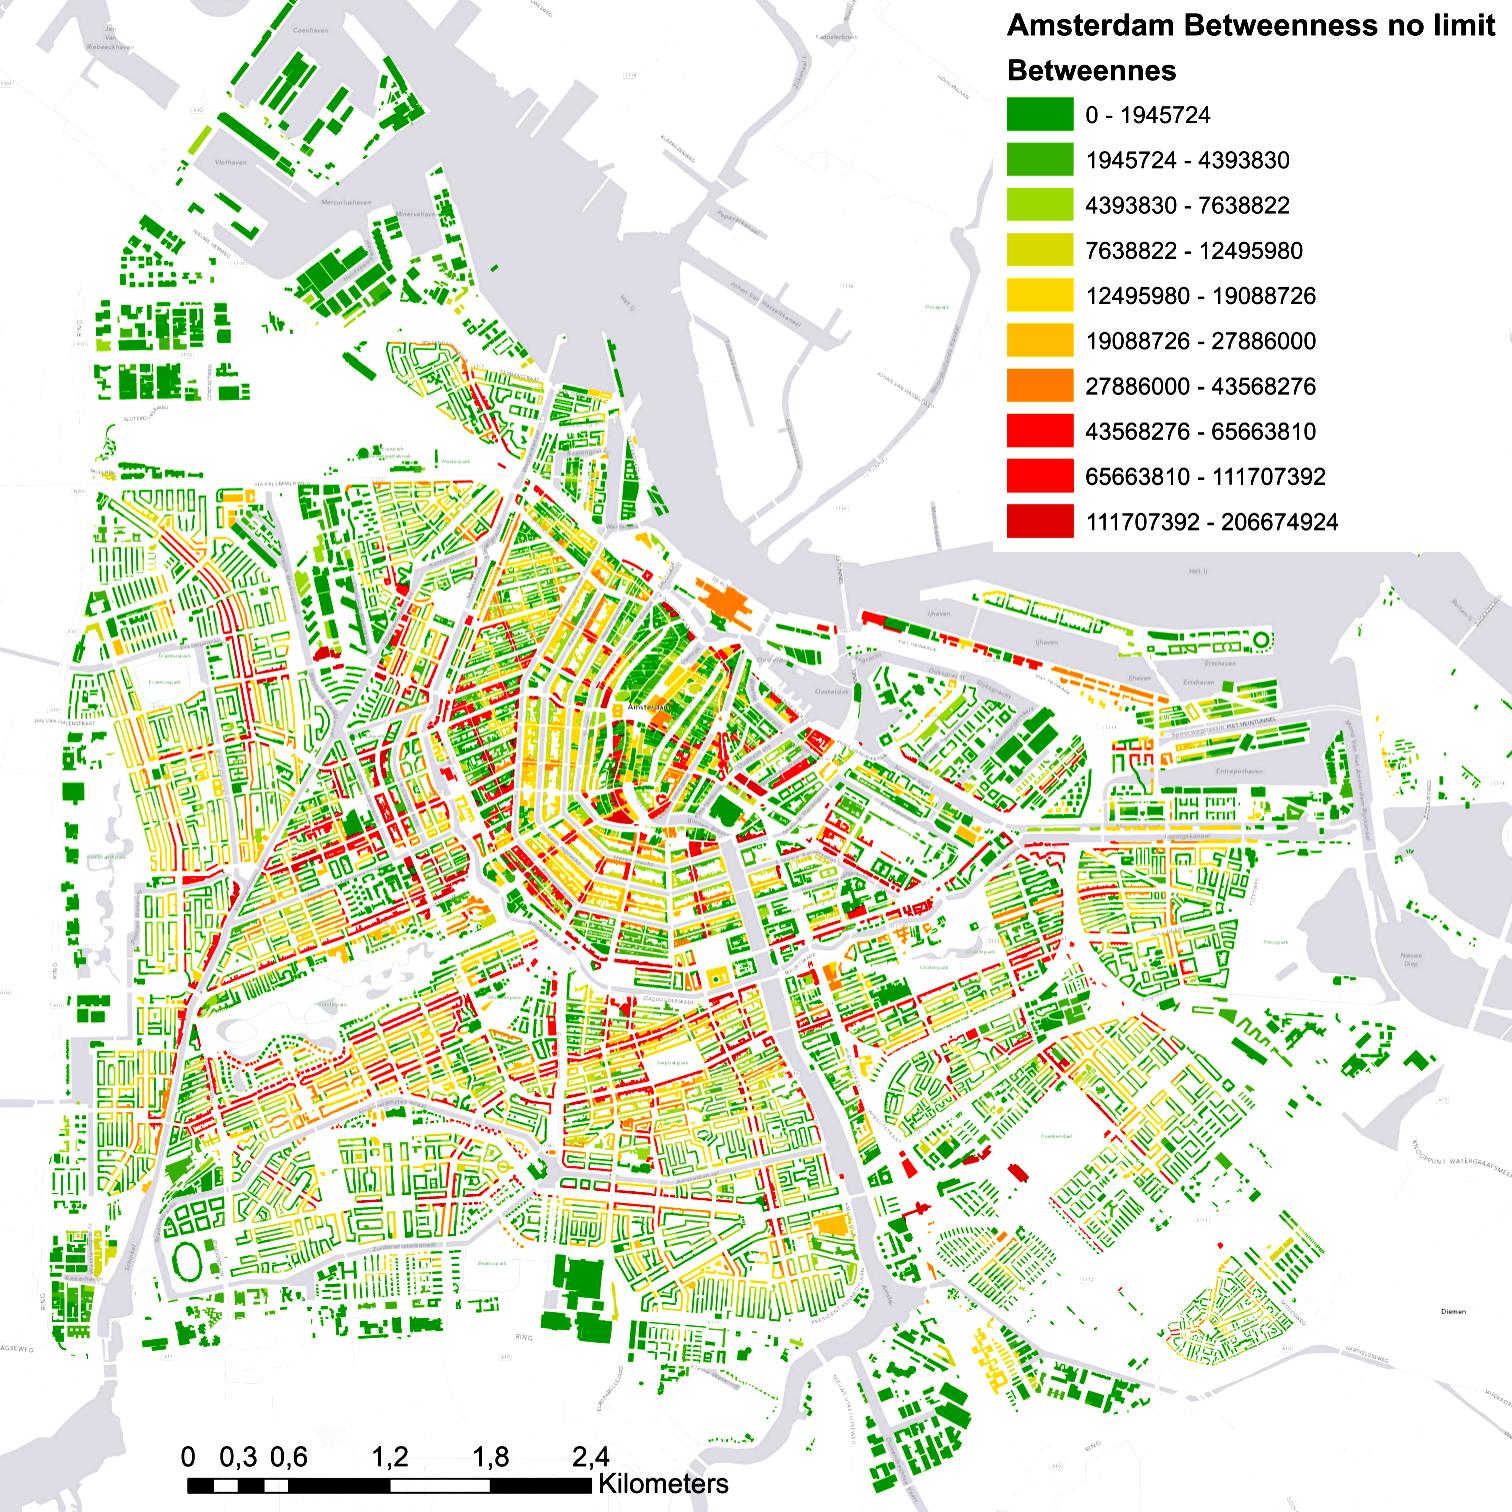 The urban network photo